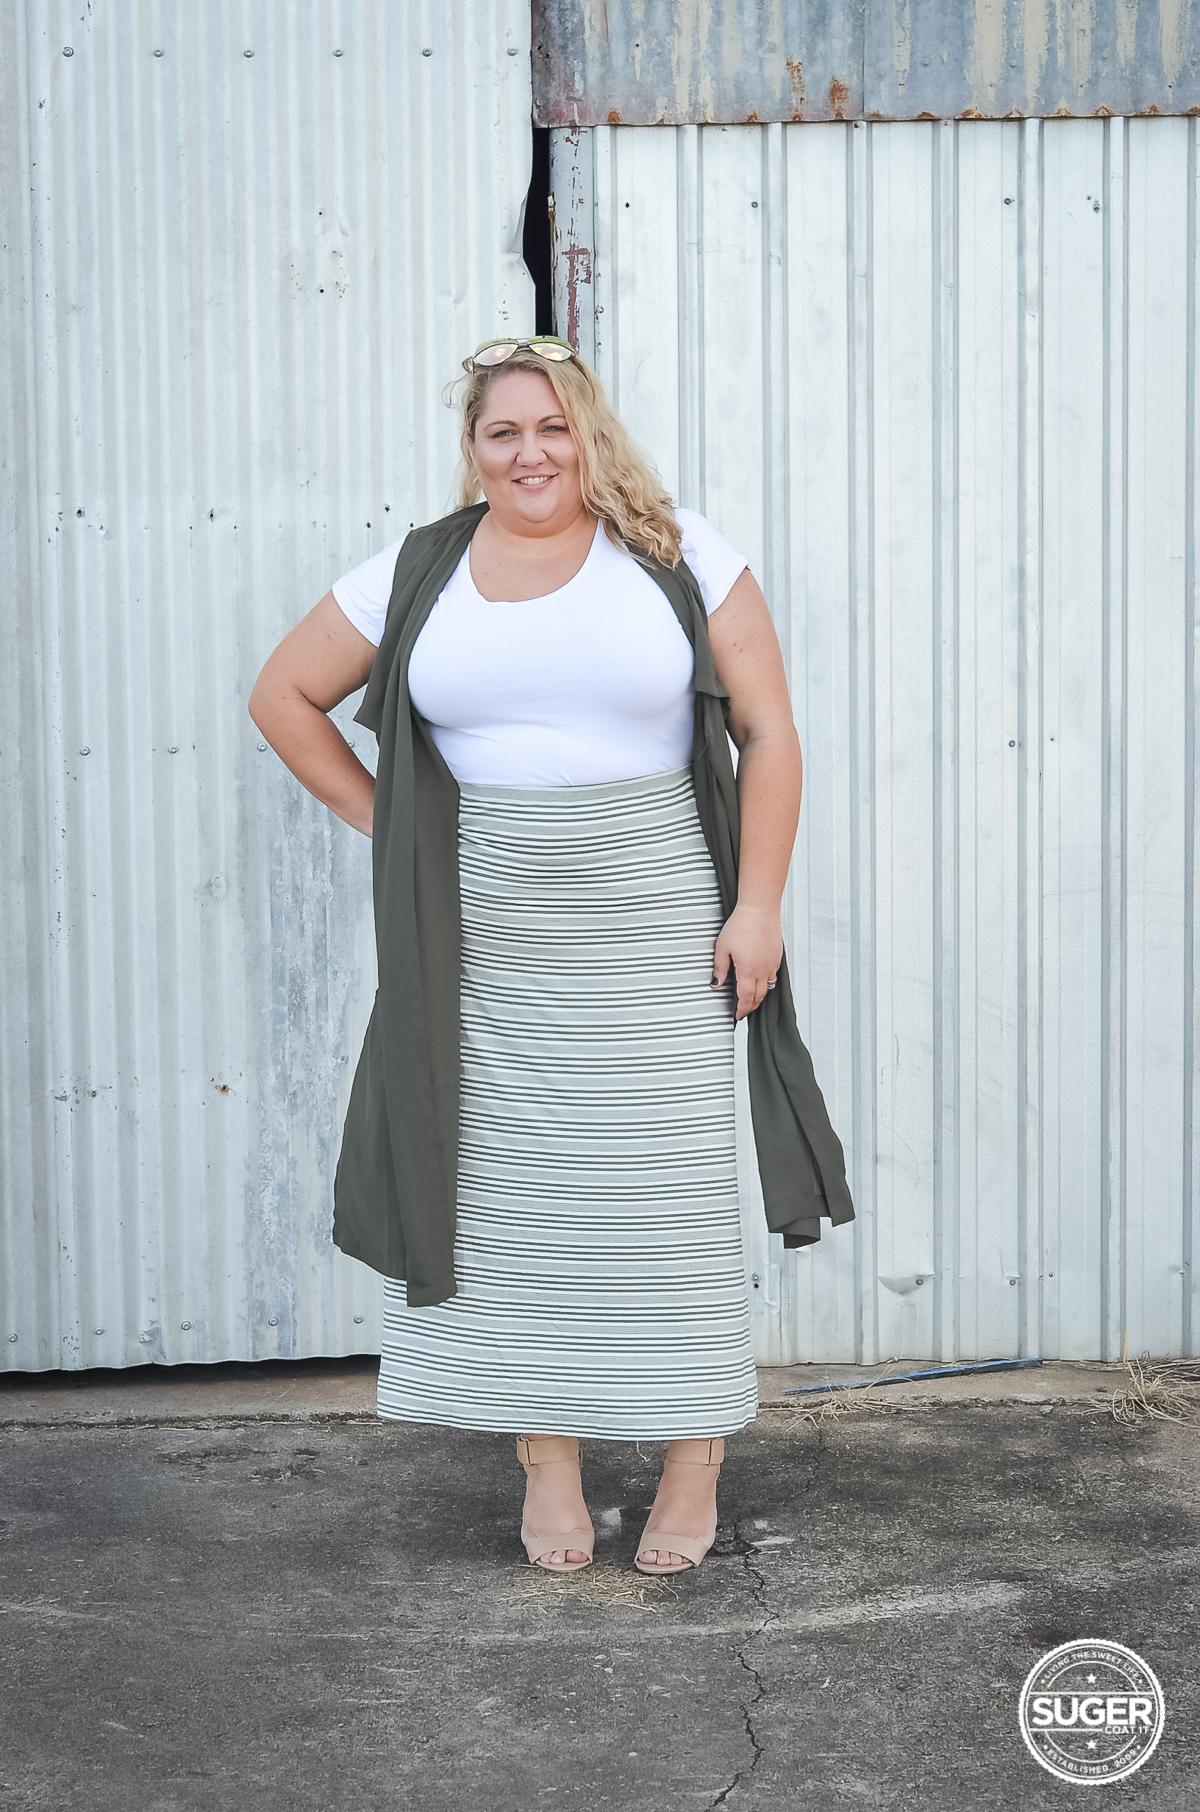 target bellecurve summer monochrome blogger review-4